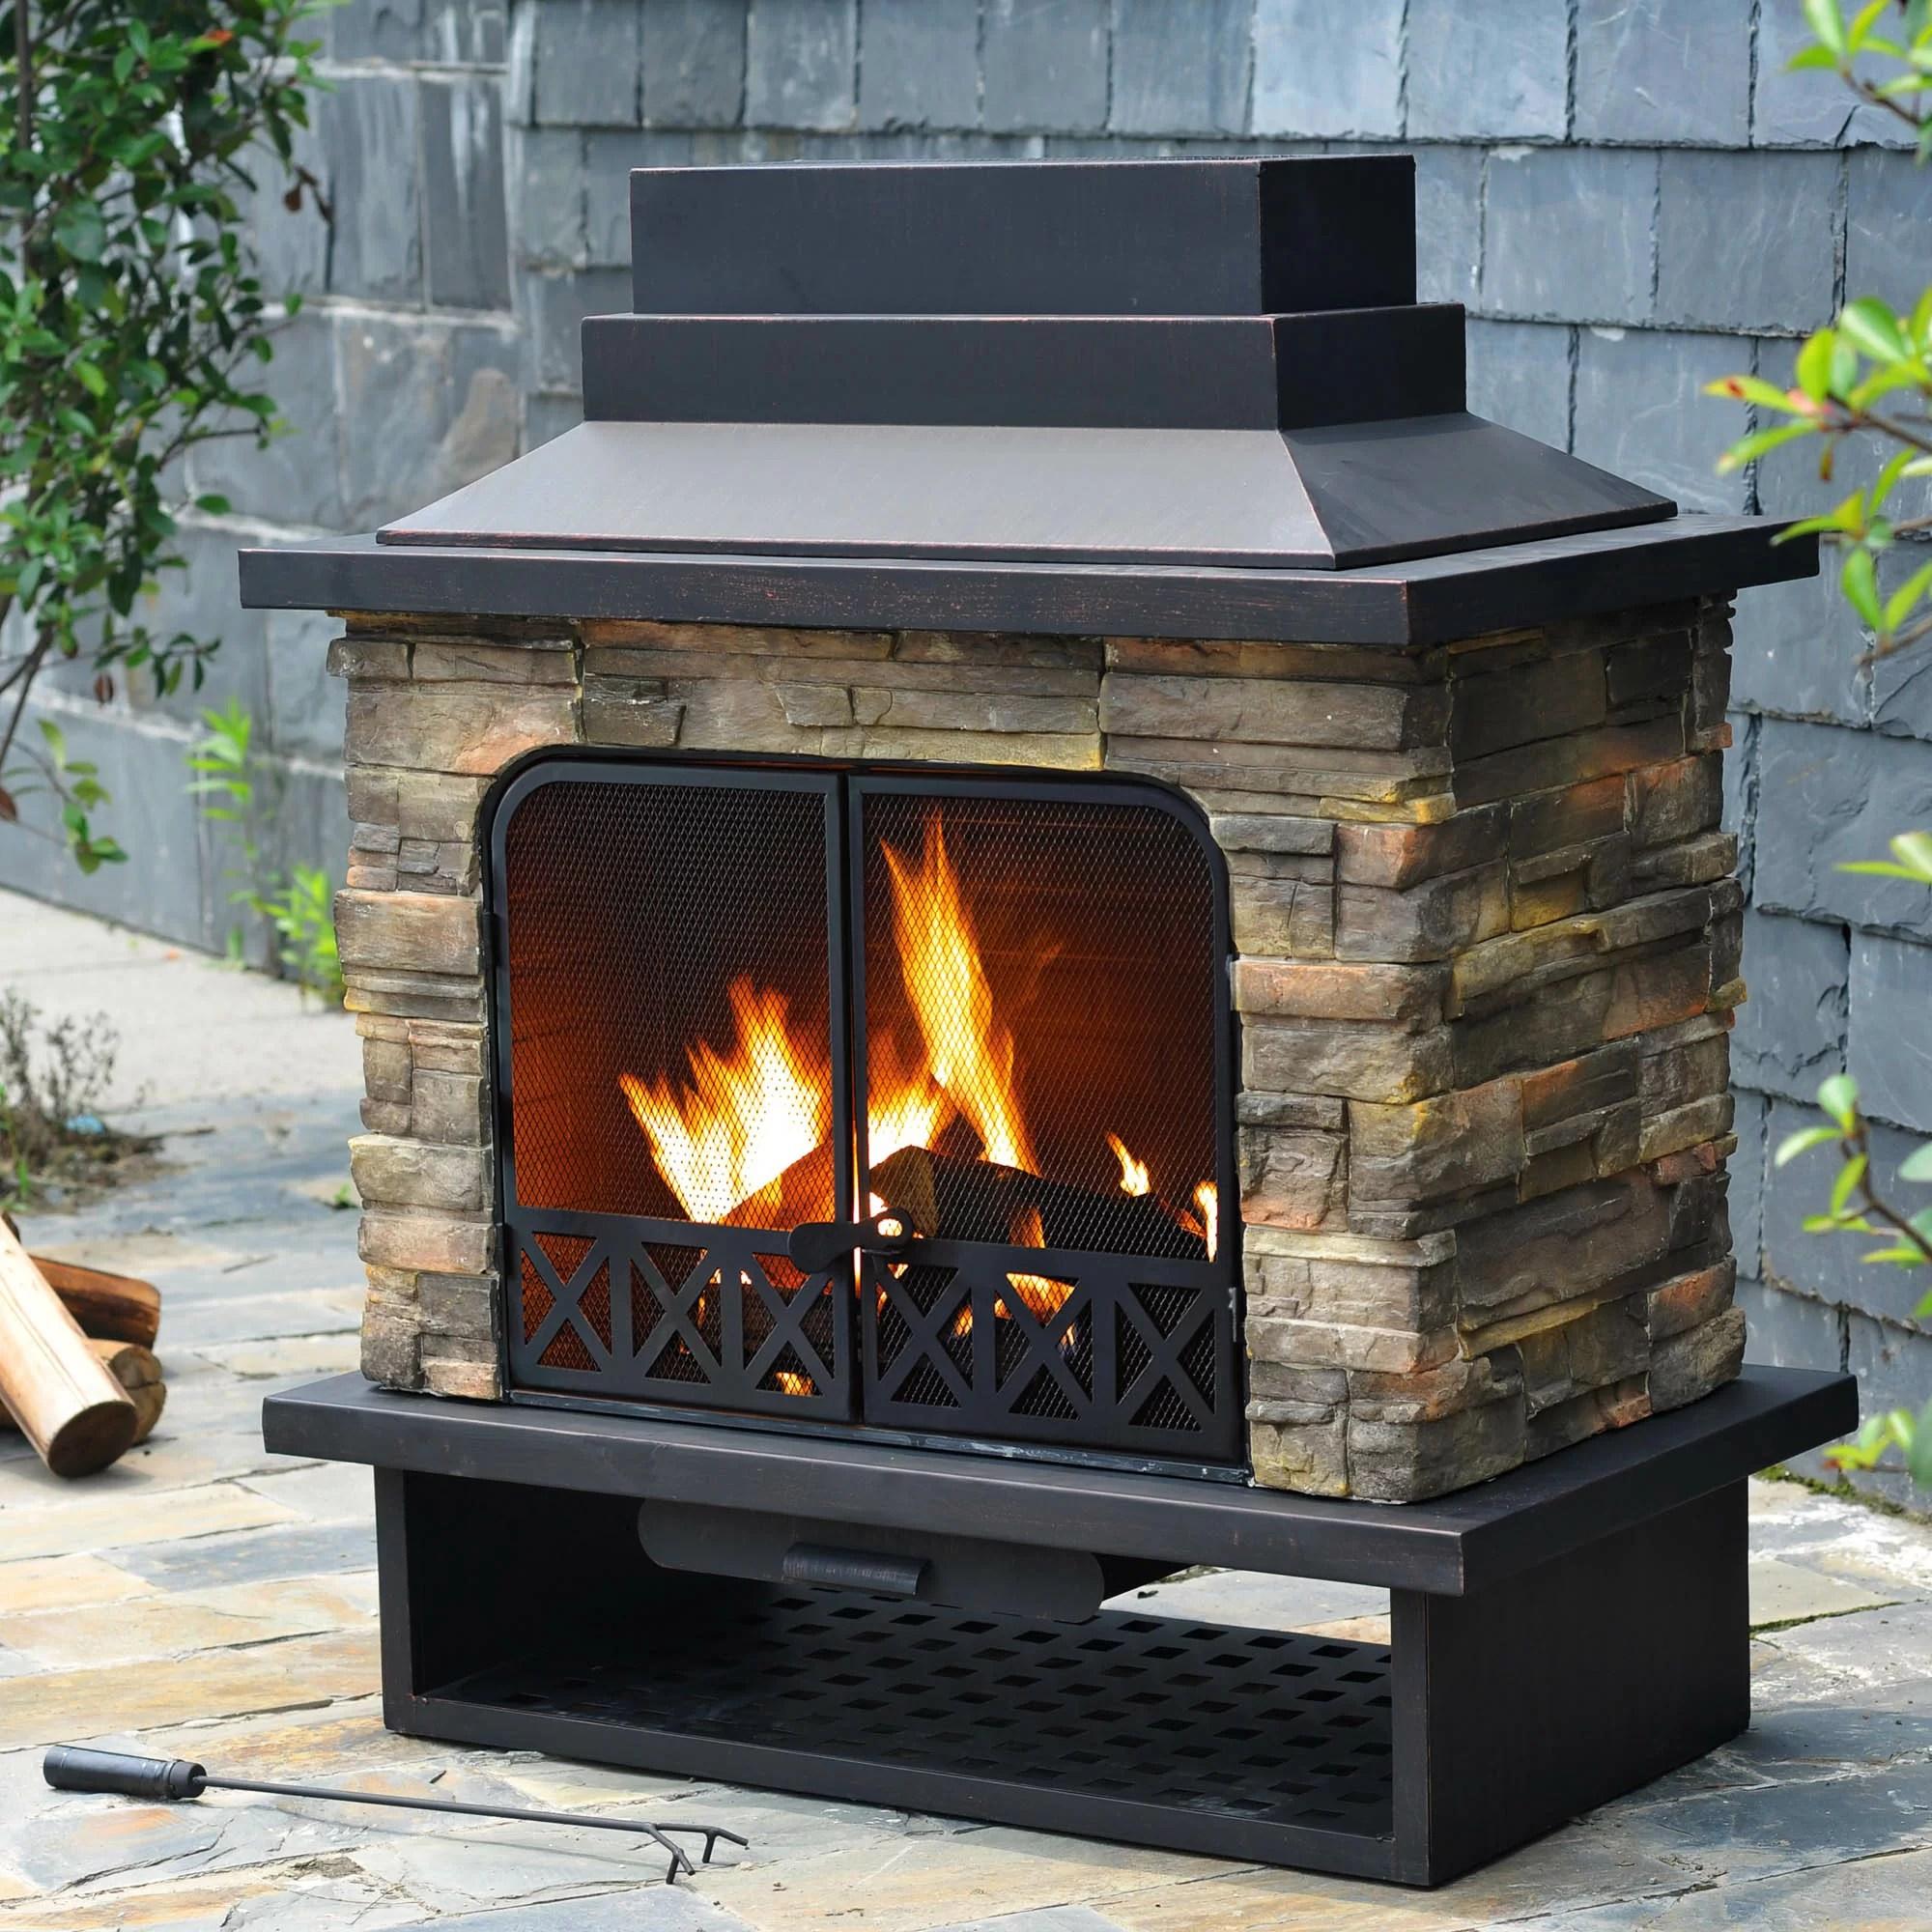 Sunjoy Felicia Steel Wood Outdoor Fireplace & Reviews ... on Quillen Steel Outdoor Fireplace  id=12329